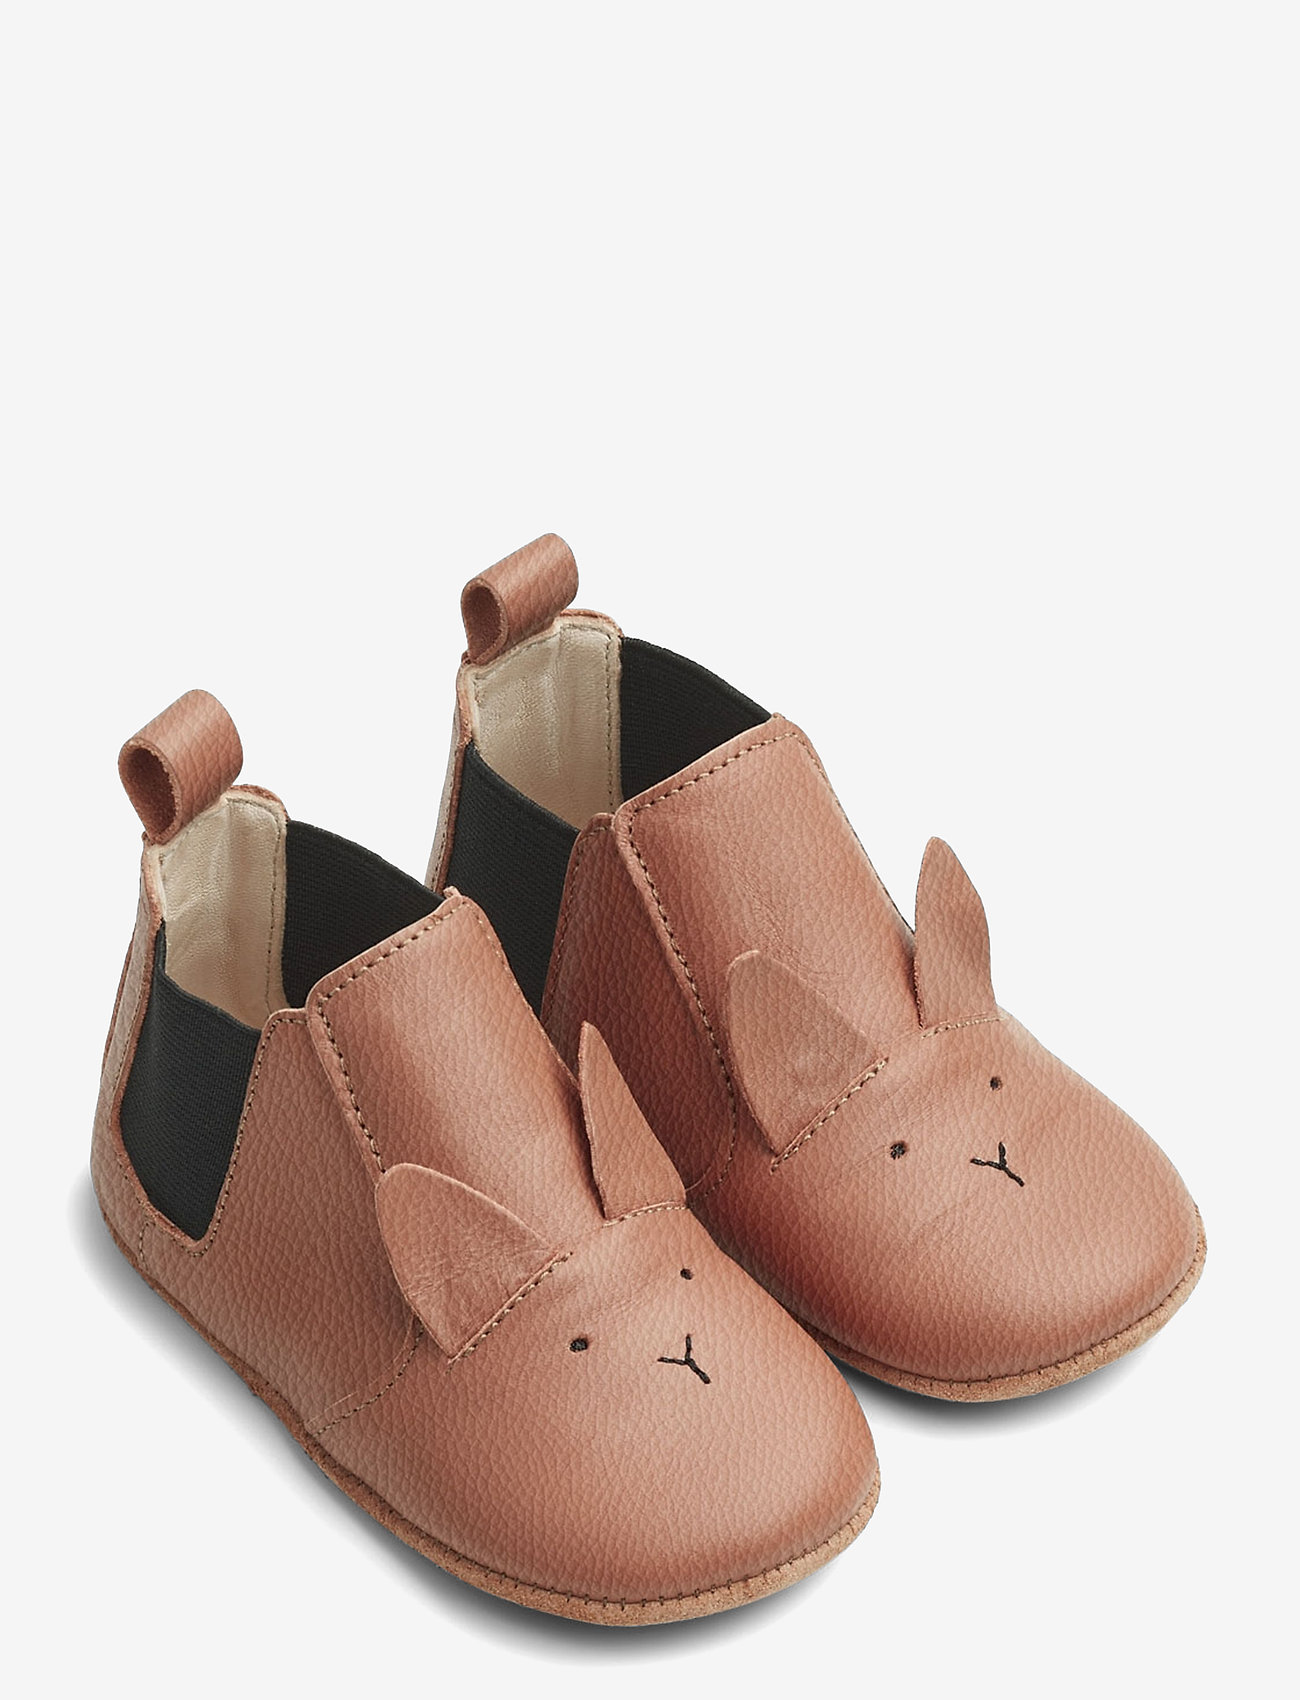 Liewood - Edith leather slippers - domowe - rabbit tuscany rose - 0